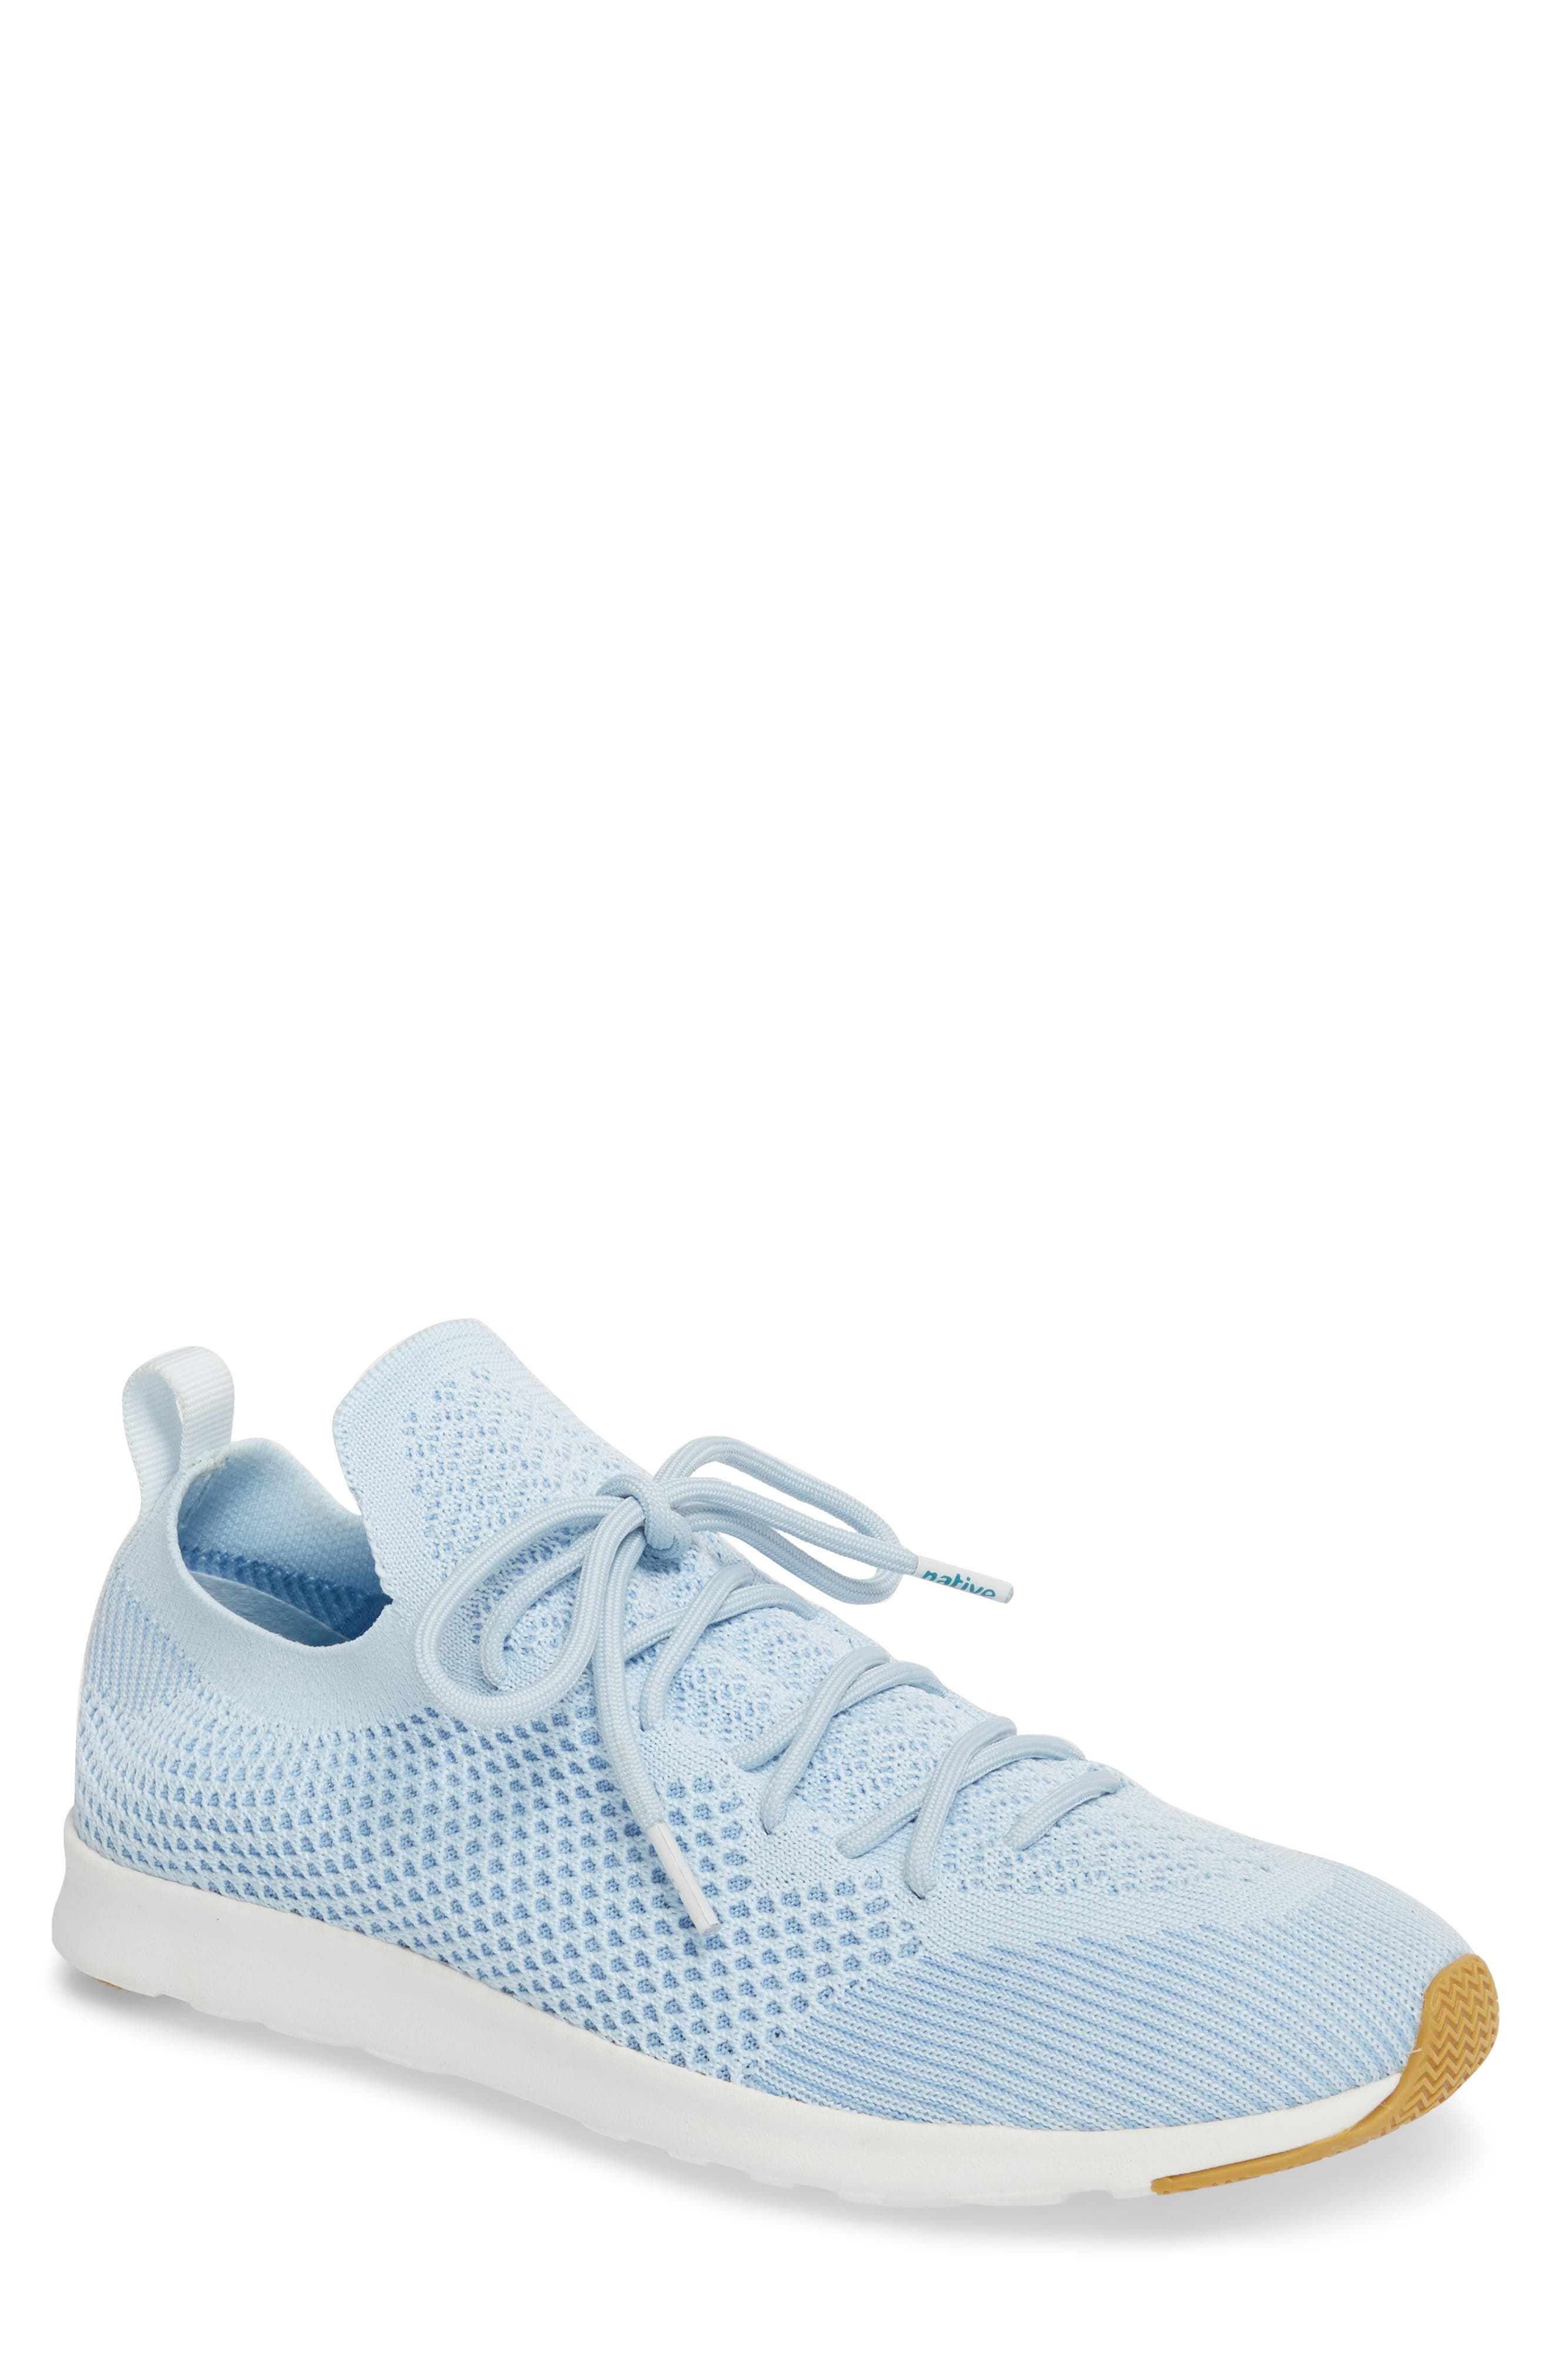 AP Mercury Liteknit<sup>™</sup> Sneaker,                         Main,                         color, AIR BLUE/ SHELL WHITE